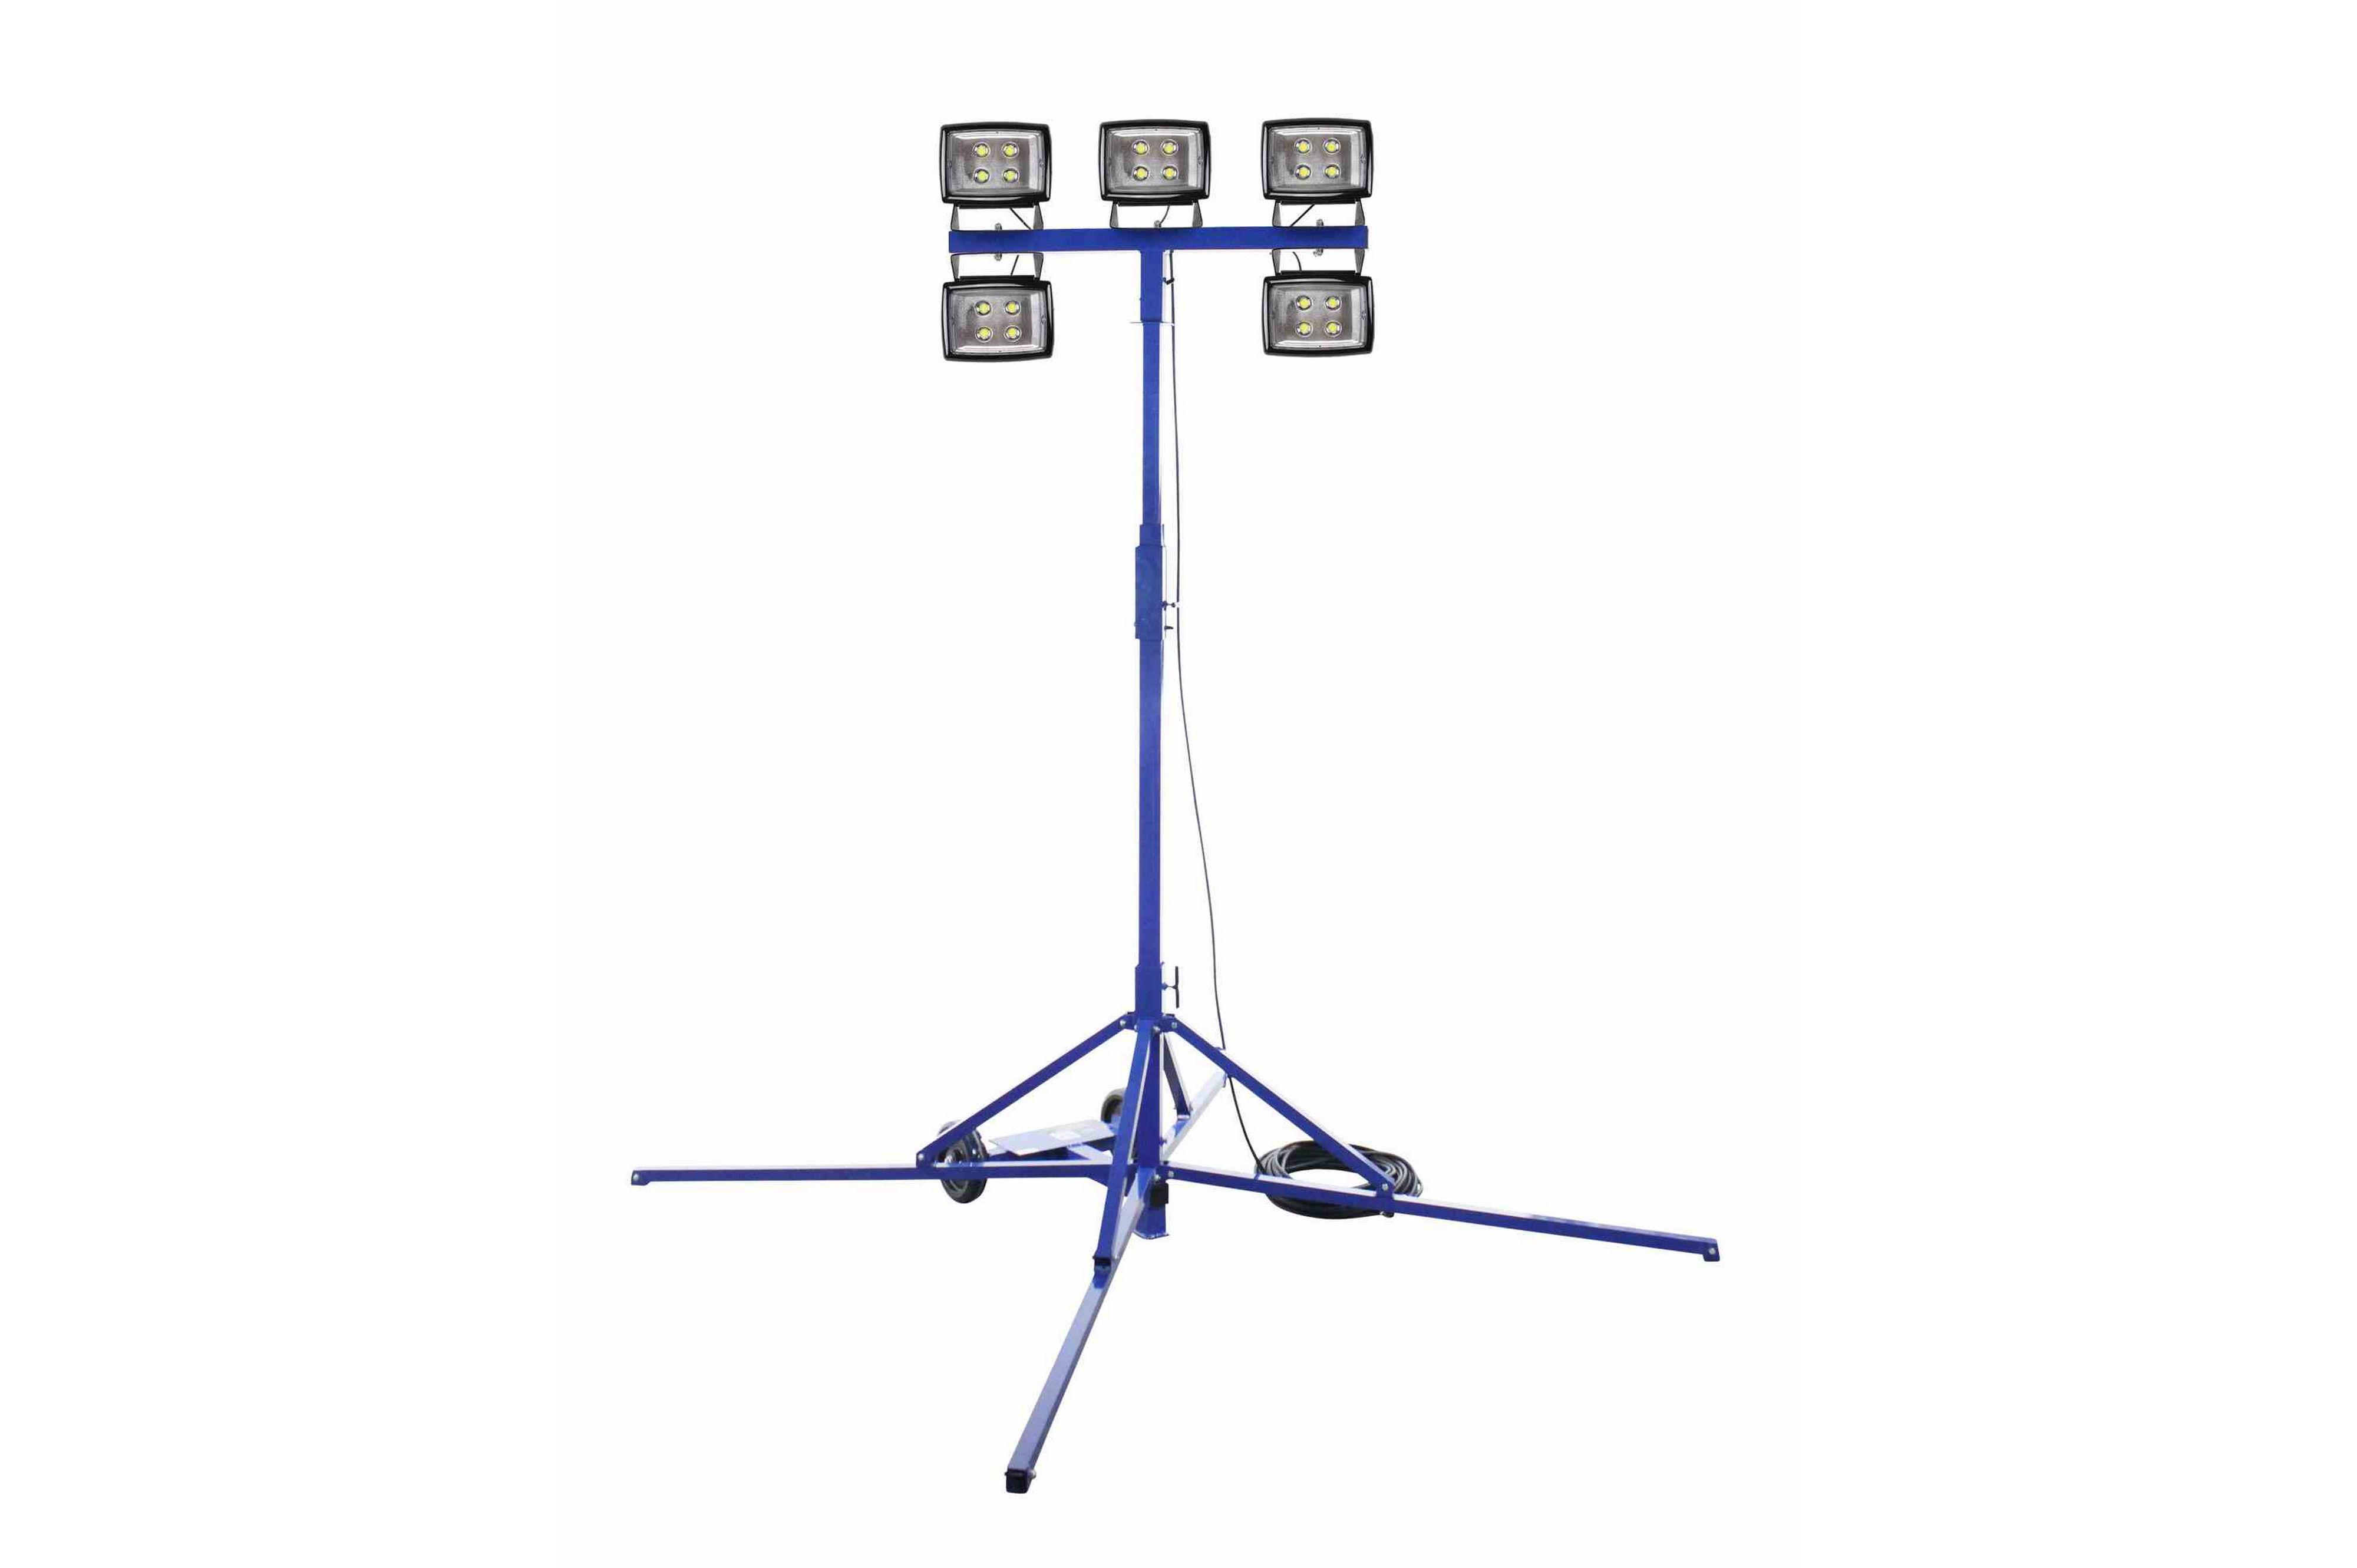 250 Watt Led Work Area Quadpod Light Fixture